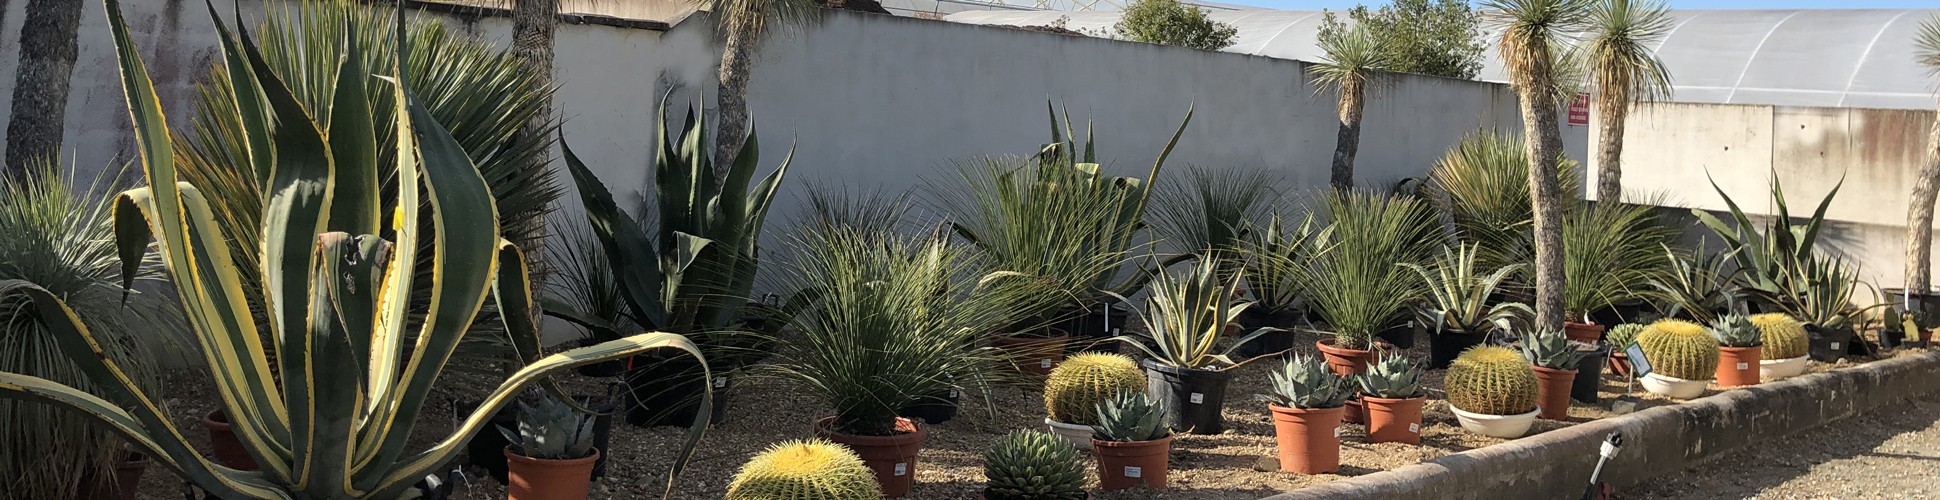 Nos plantes xénophites